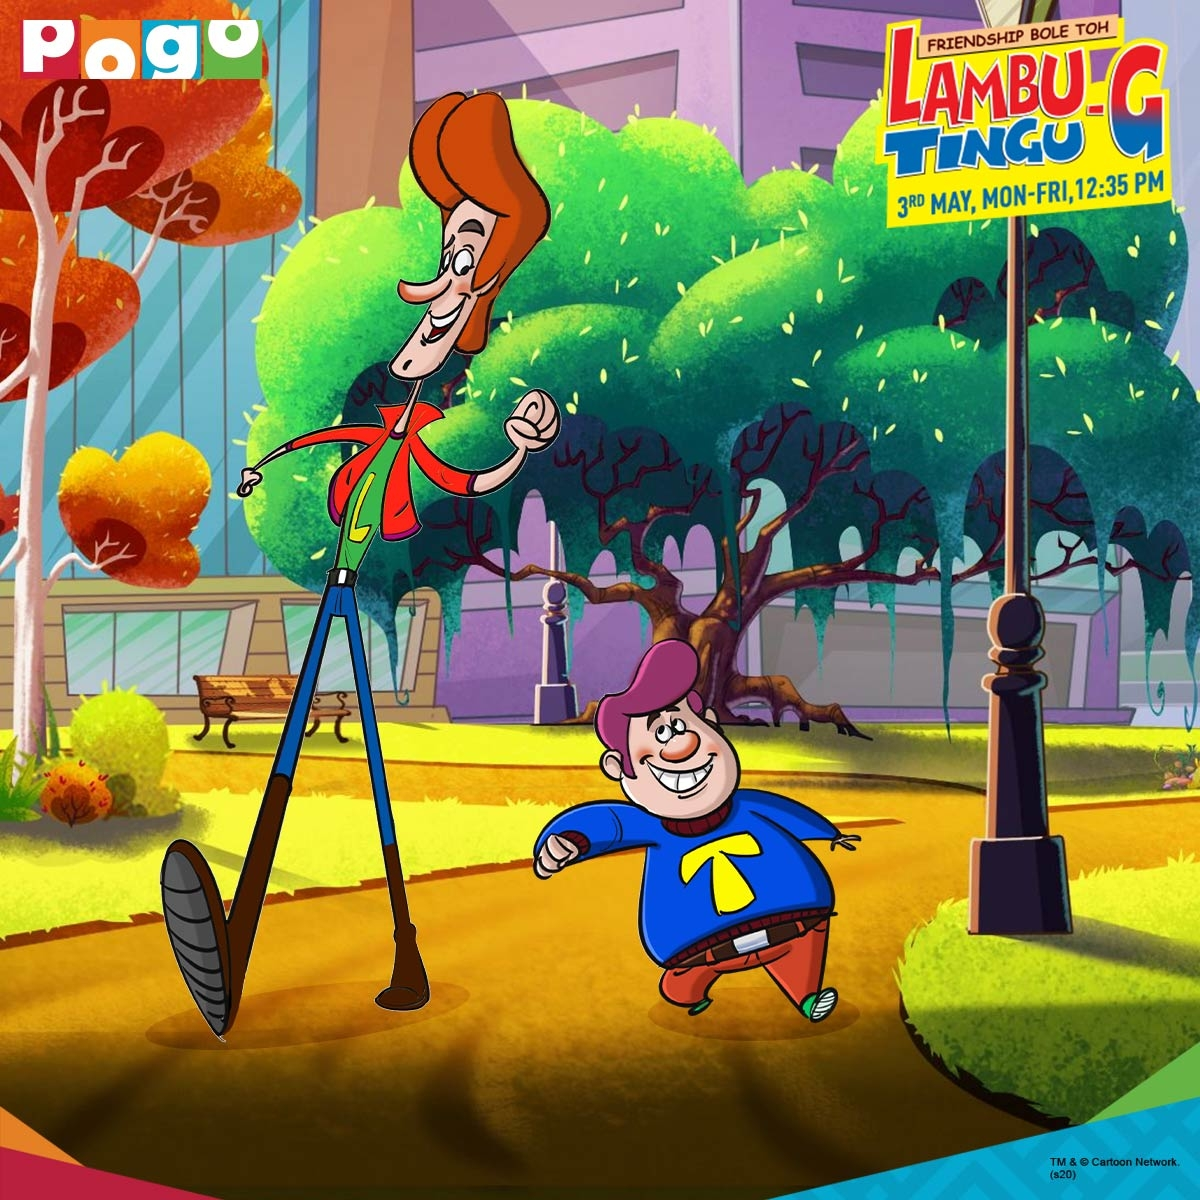 """Content matters more than medium in kids' entertainment"": Abhishek Dutta, POGO and Cartoon Network"